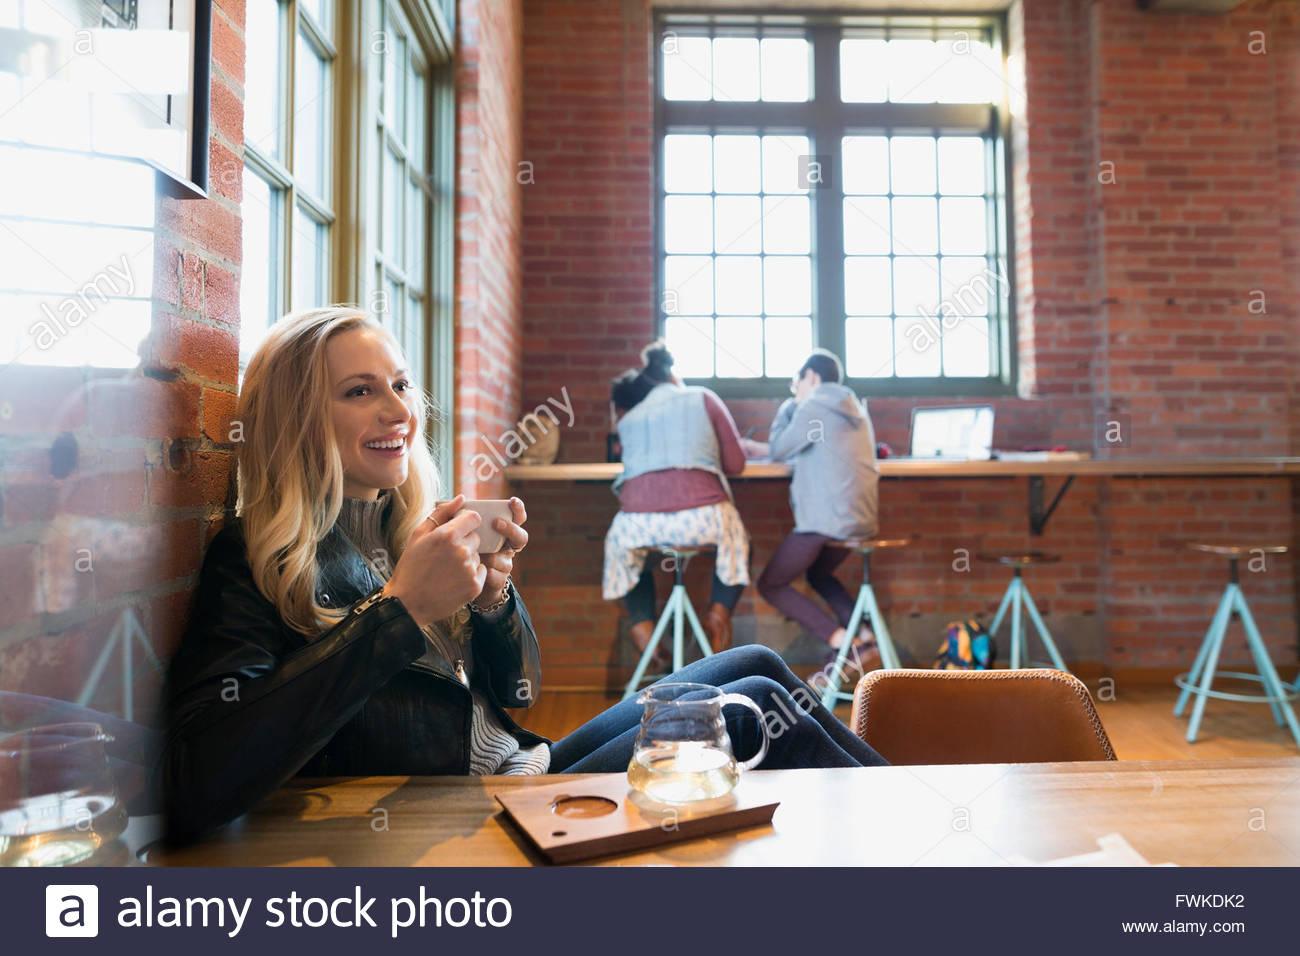 Lächelnde junge Frau trinken Tee im Café Stockbild